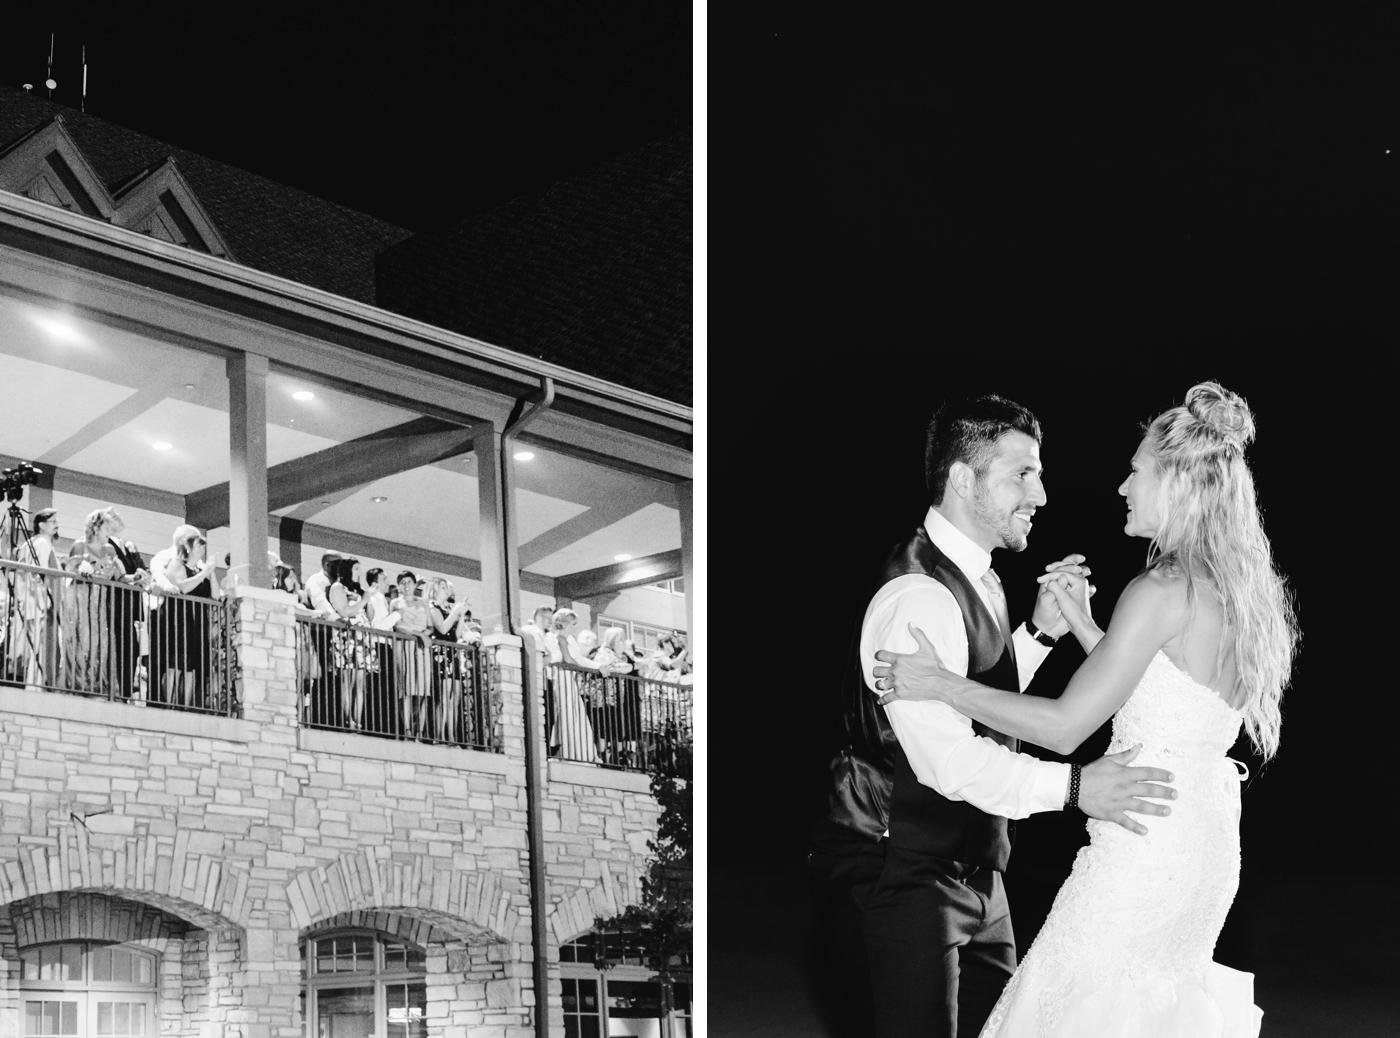 chicago-fine-art-wedding-photography-patano51